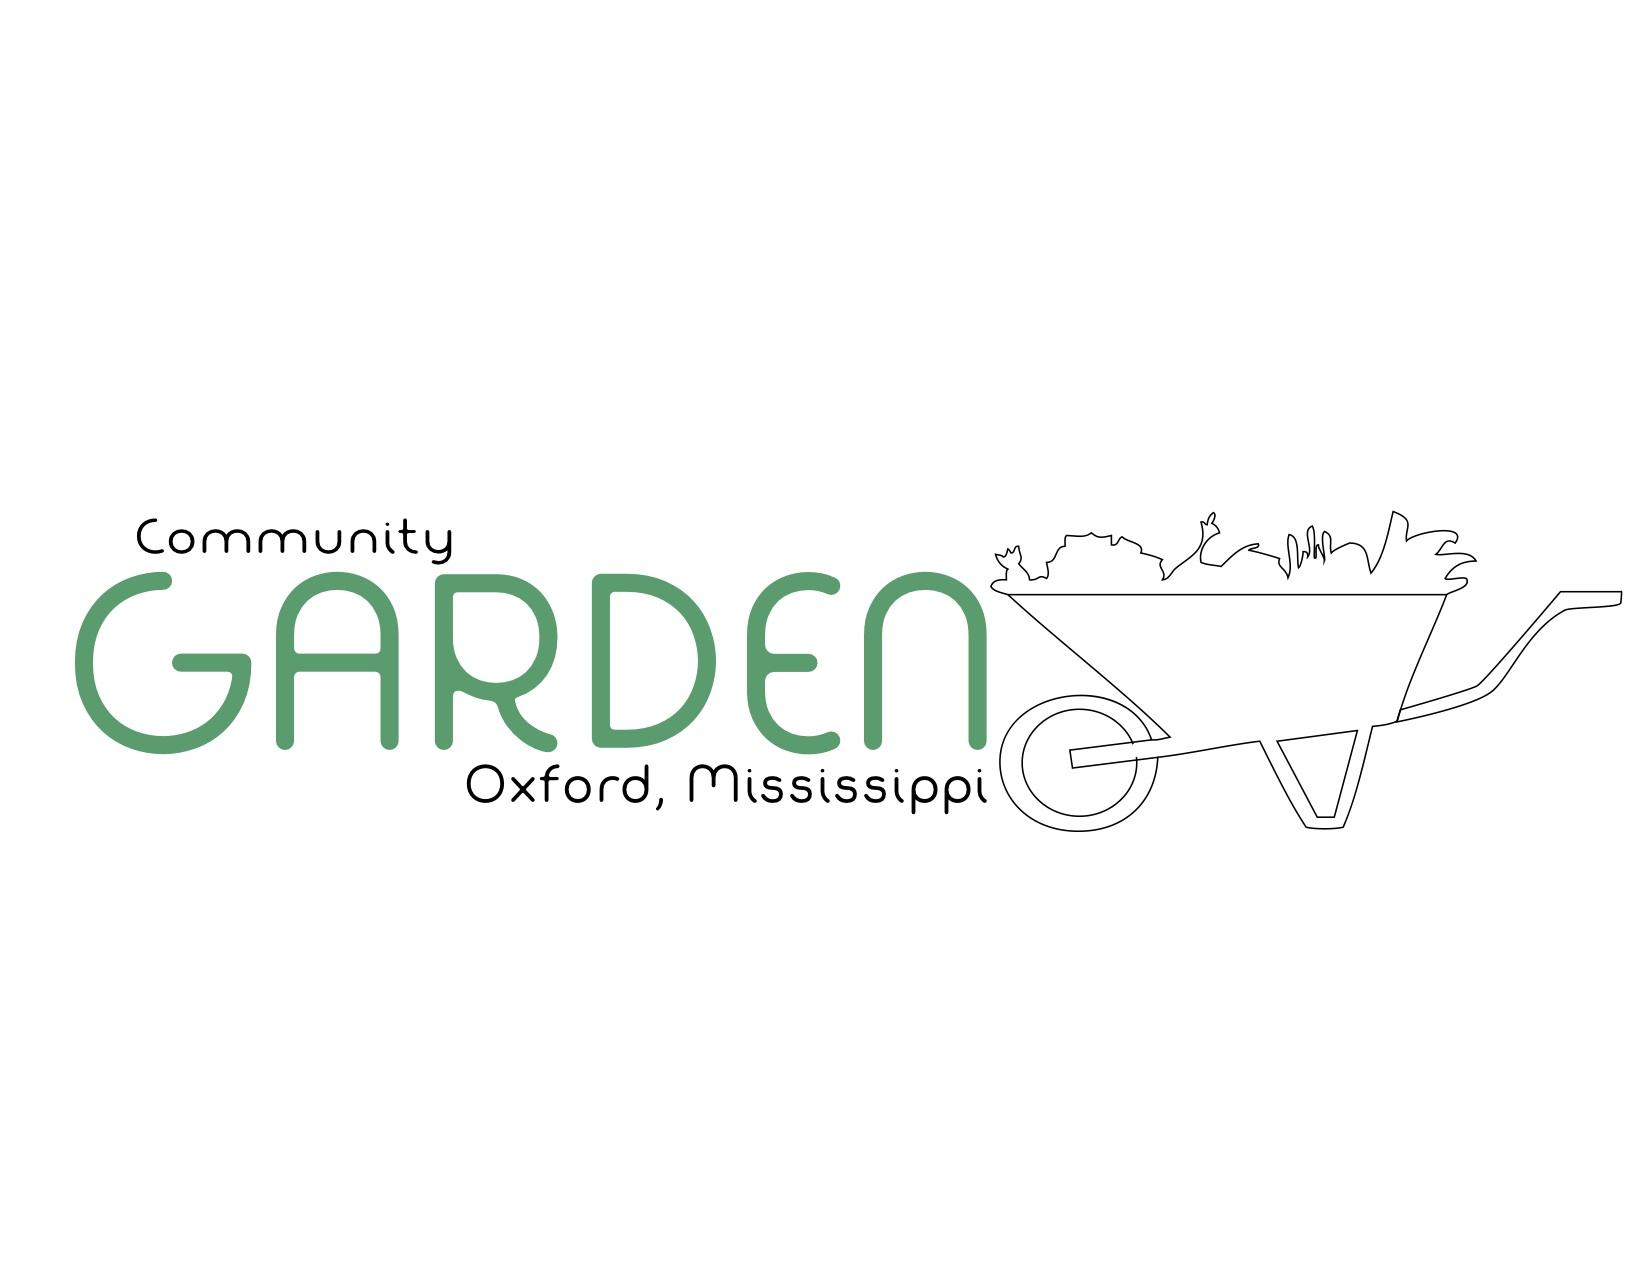 community garden oxford.jpg